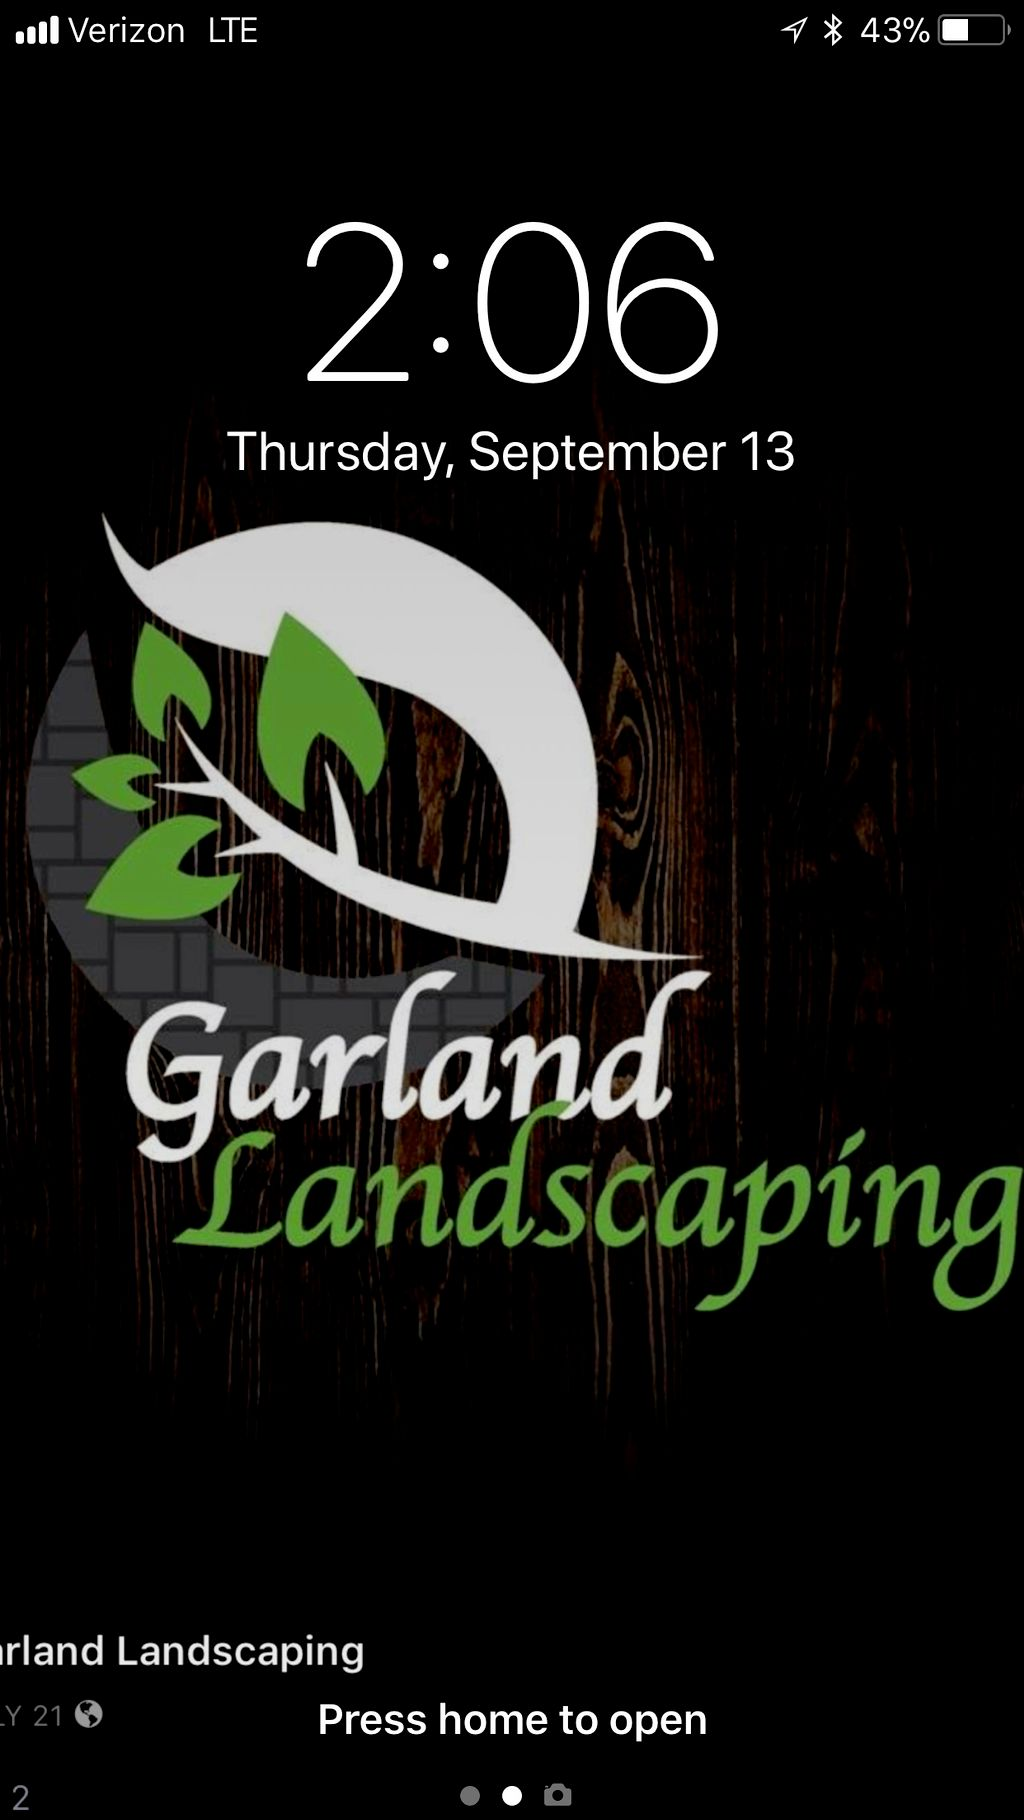 Garland Landscaping